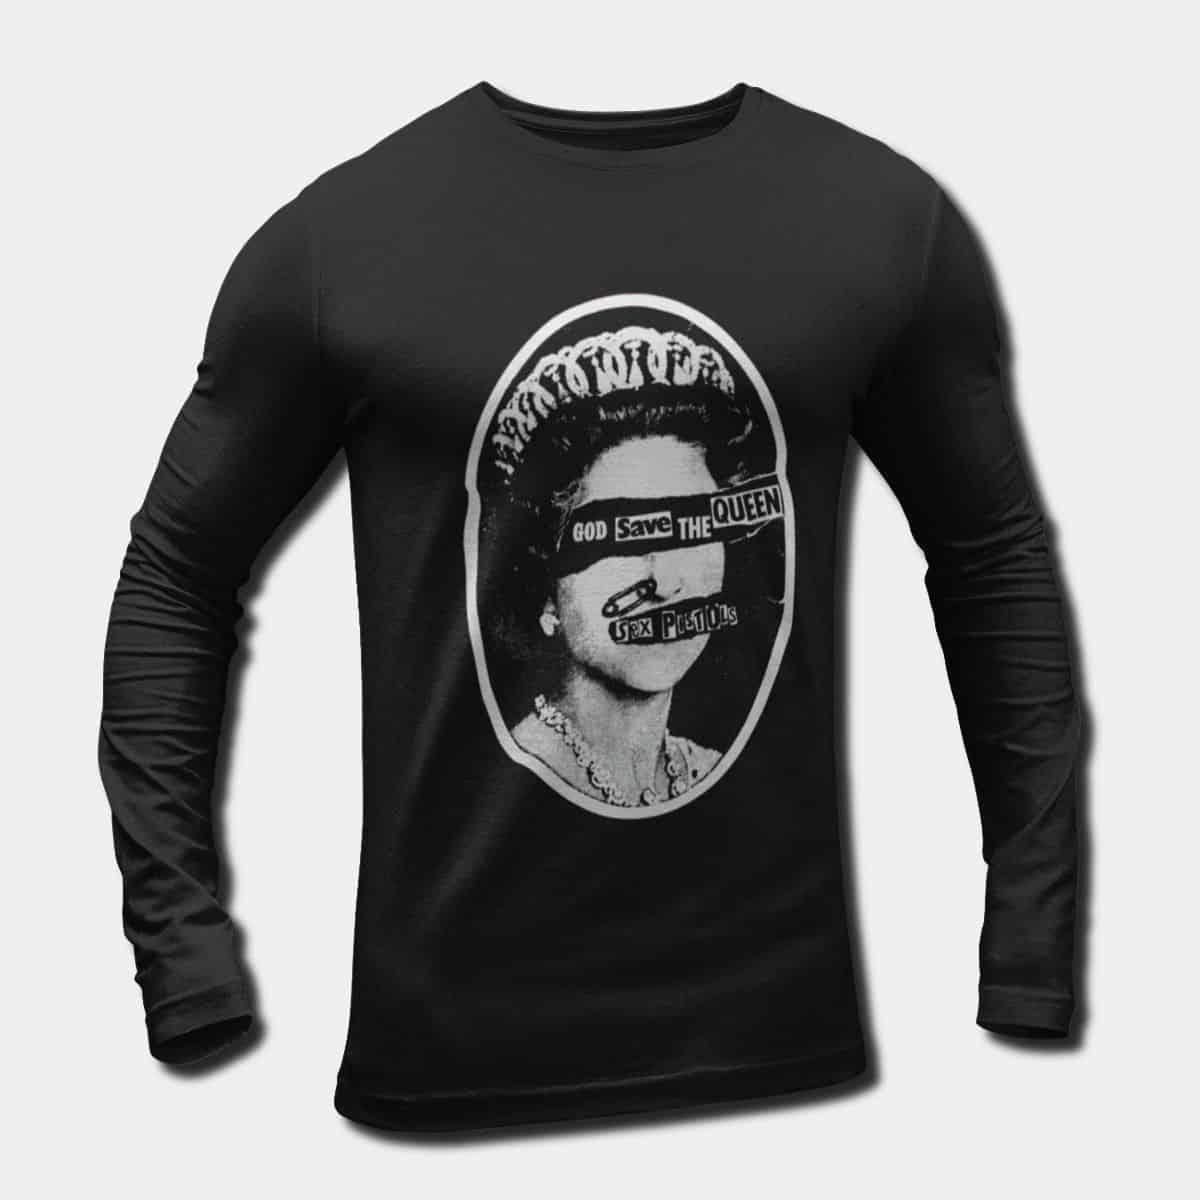 ce85d6f0c9d7 Sex Pistols Band Long Sleeve T-Shirt, Sex Pistols God Save the Queen ...